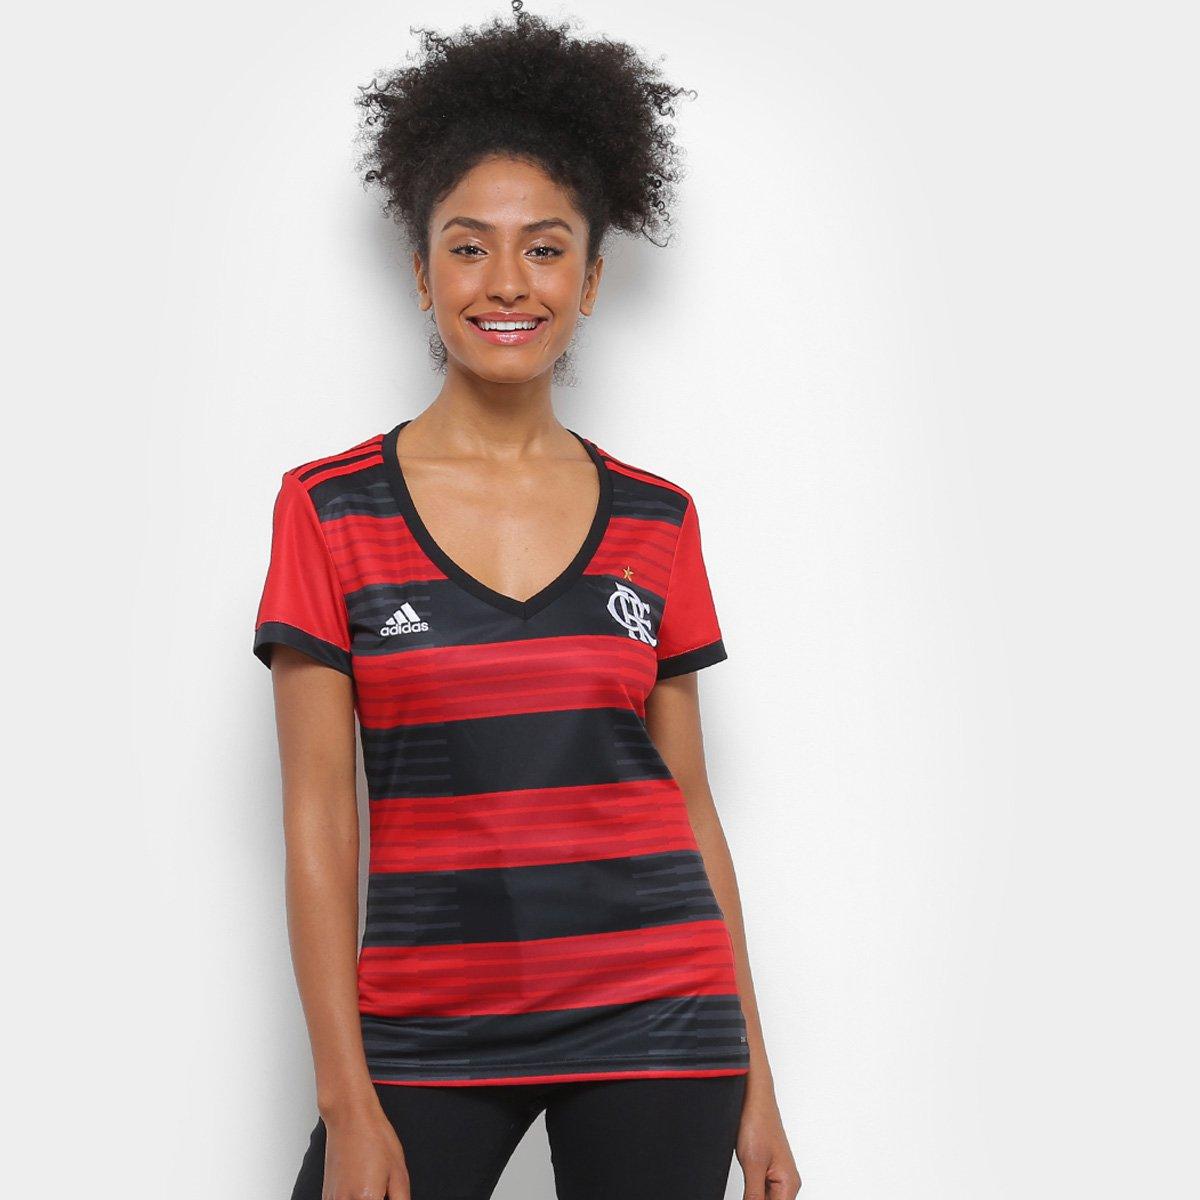 n° s Camisa Vermelho Feminina Preto Torcedor e Adidas 2018 Flamengo I nTTRwtIq6